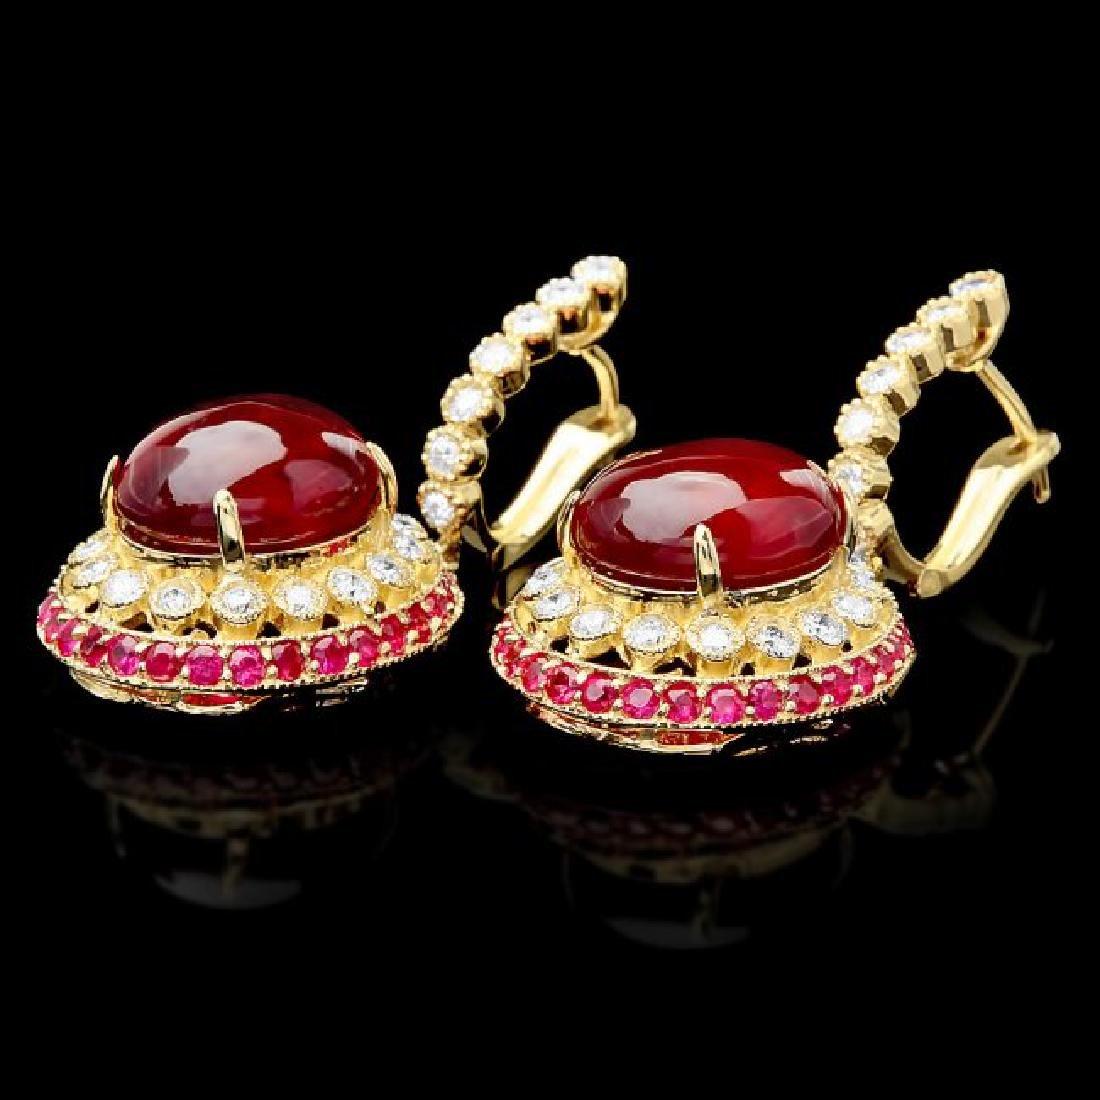 14k Gold 22.3ct Ruby 1.20ct Diamond Earrings - 2